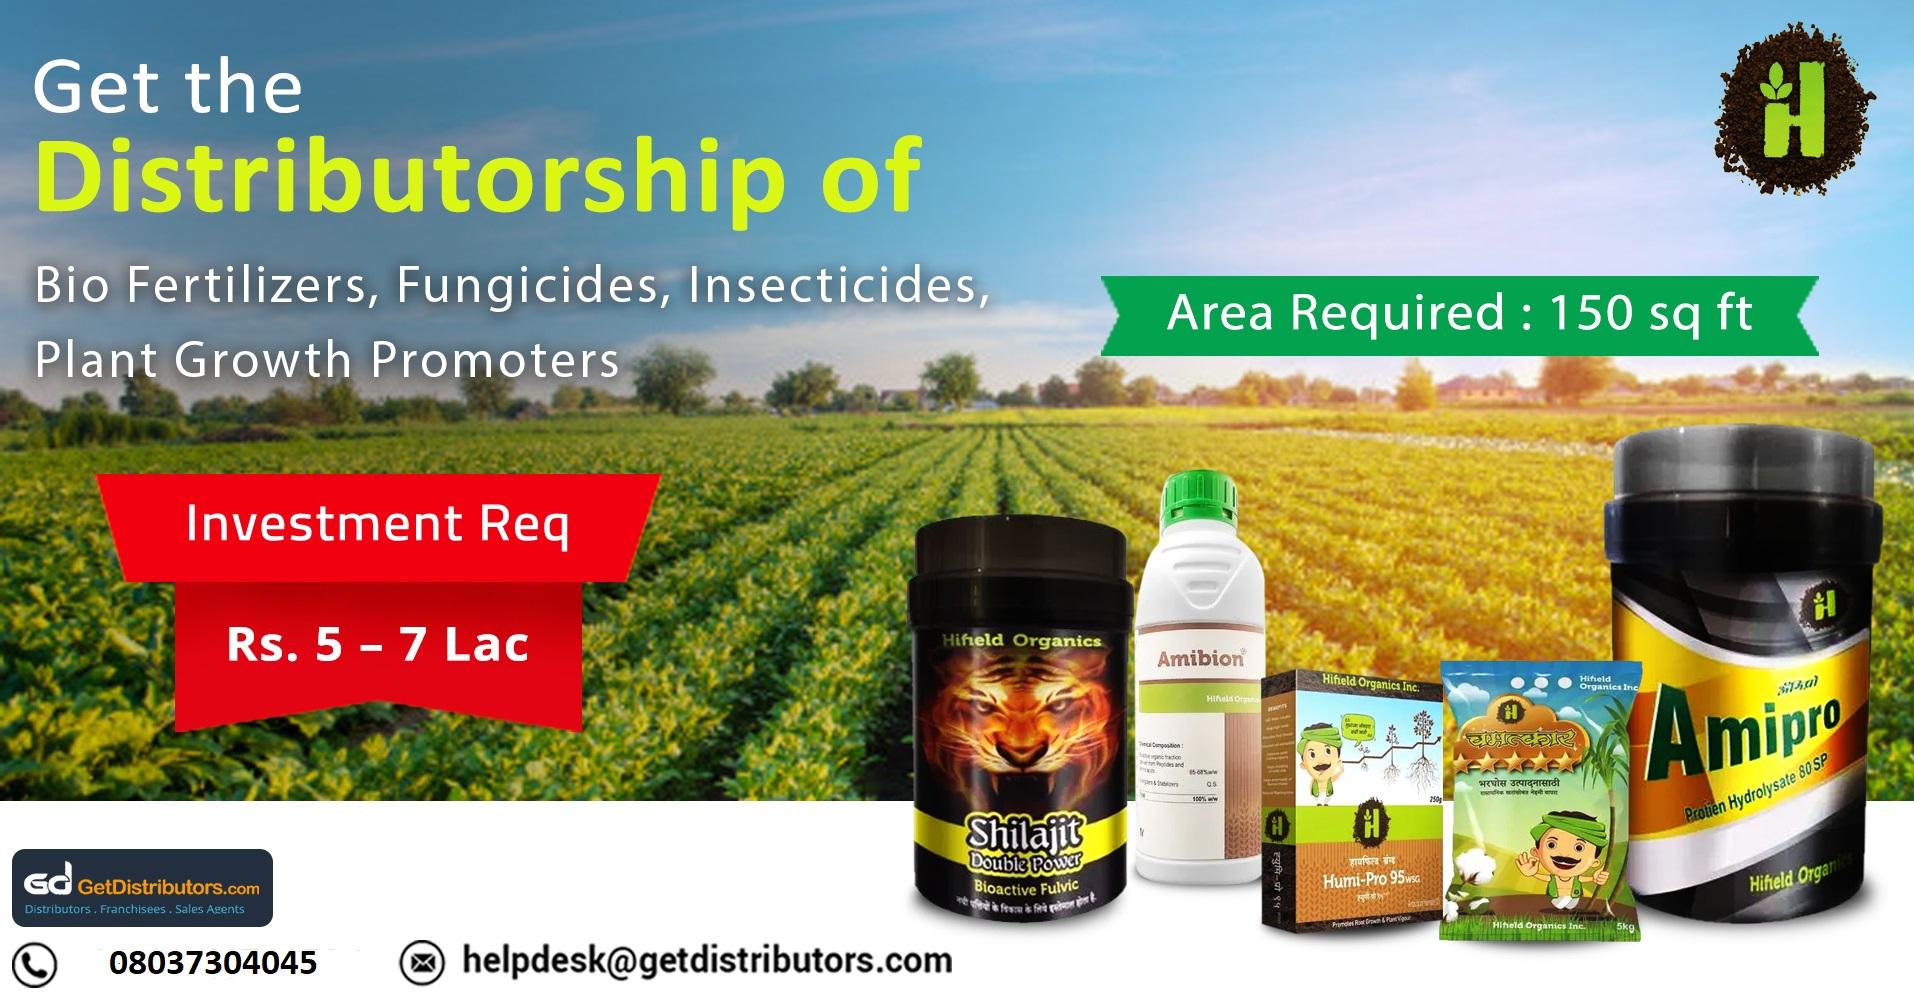 Hifield Organics